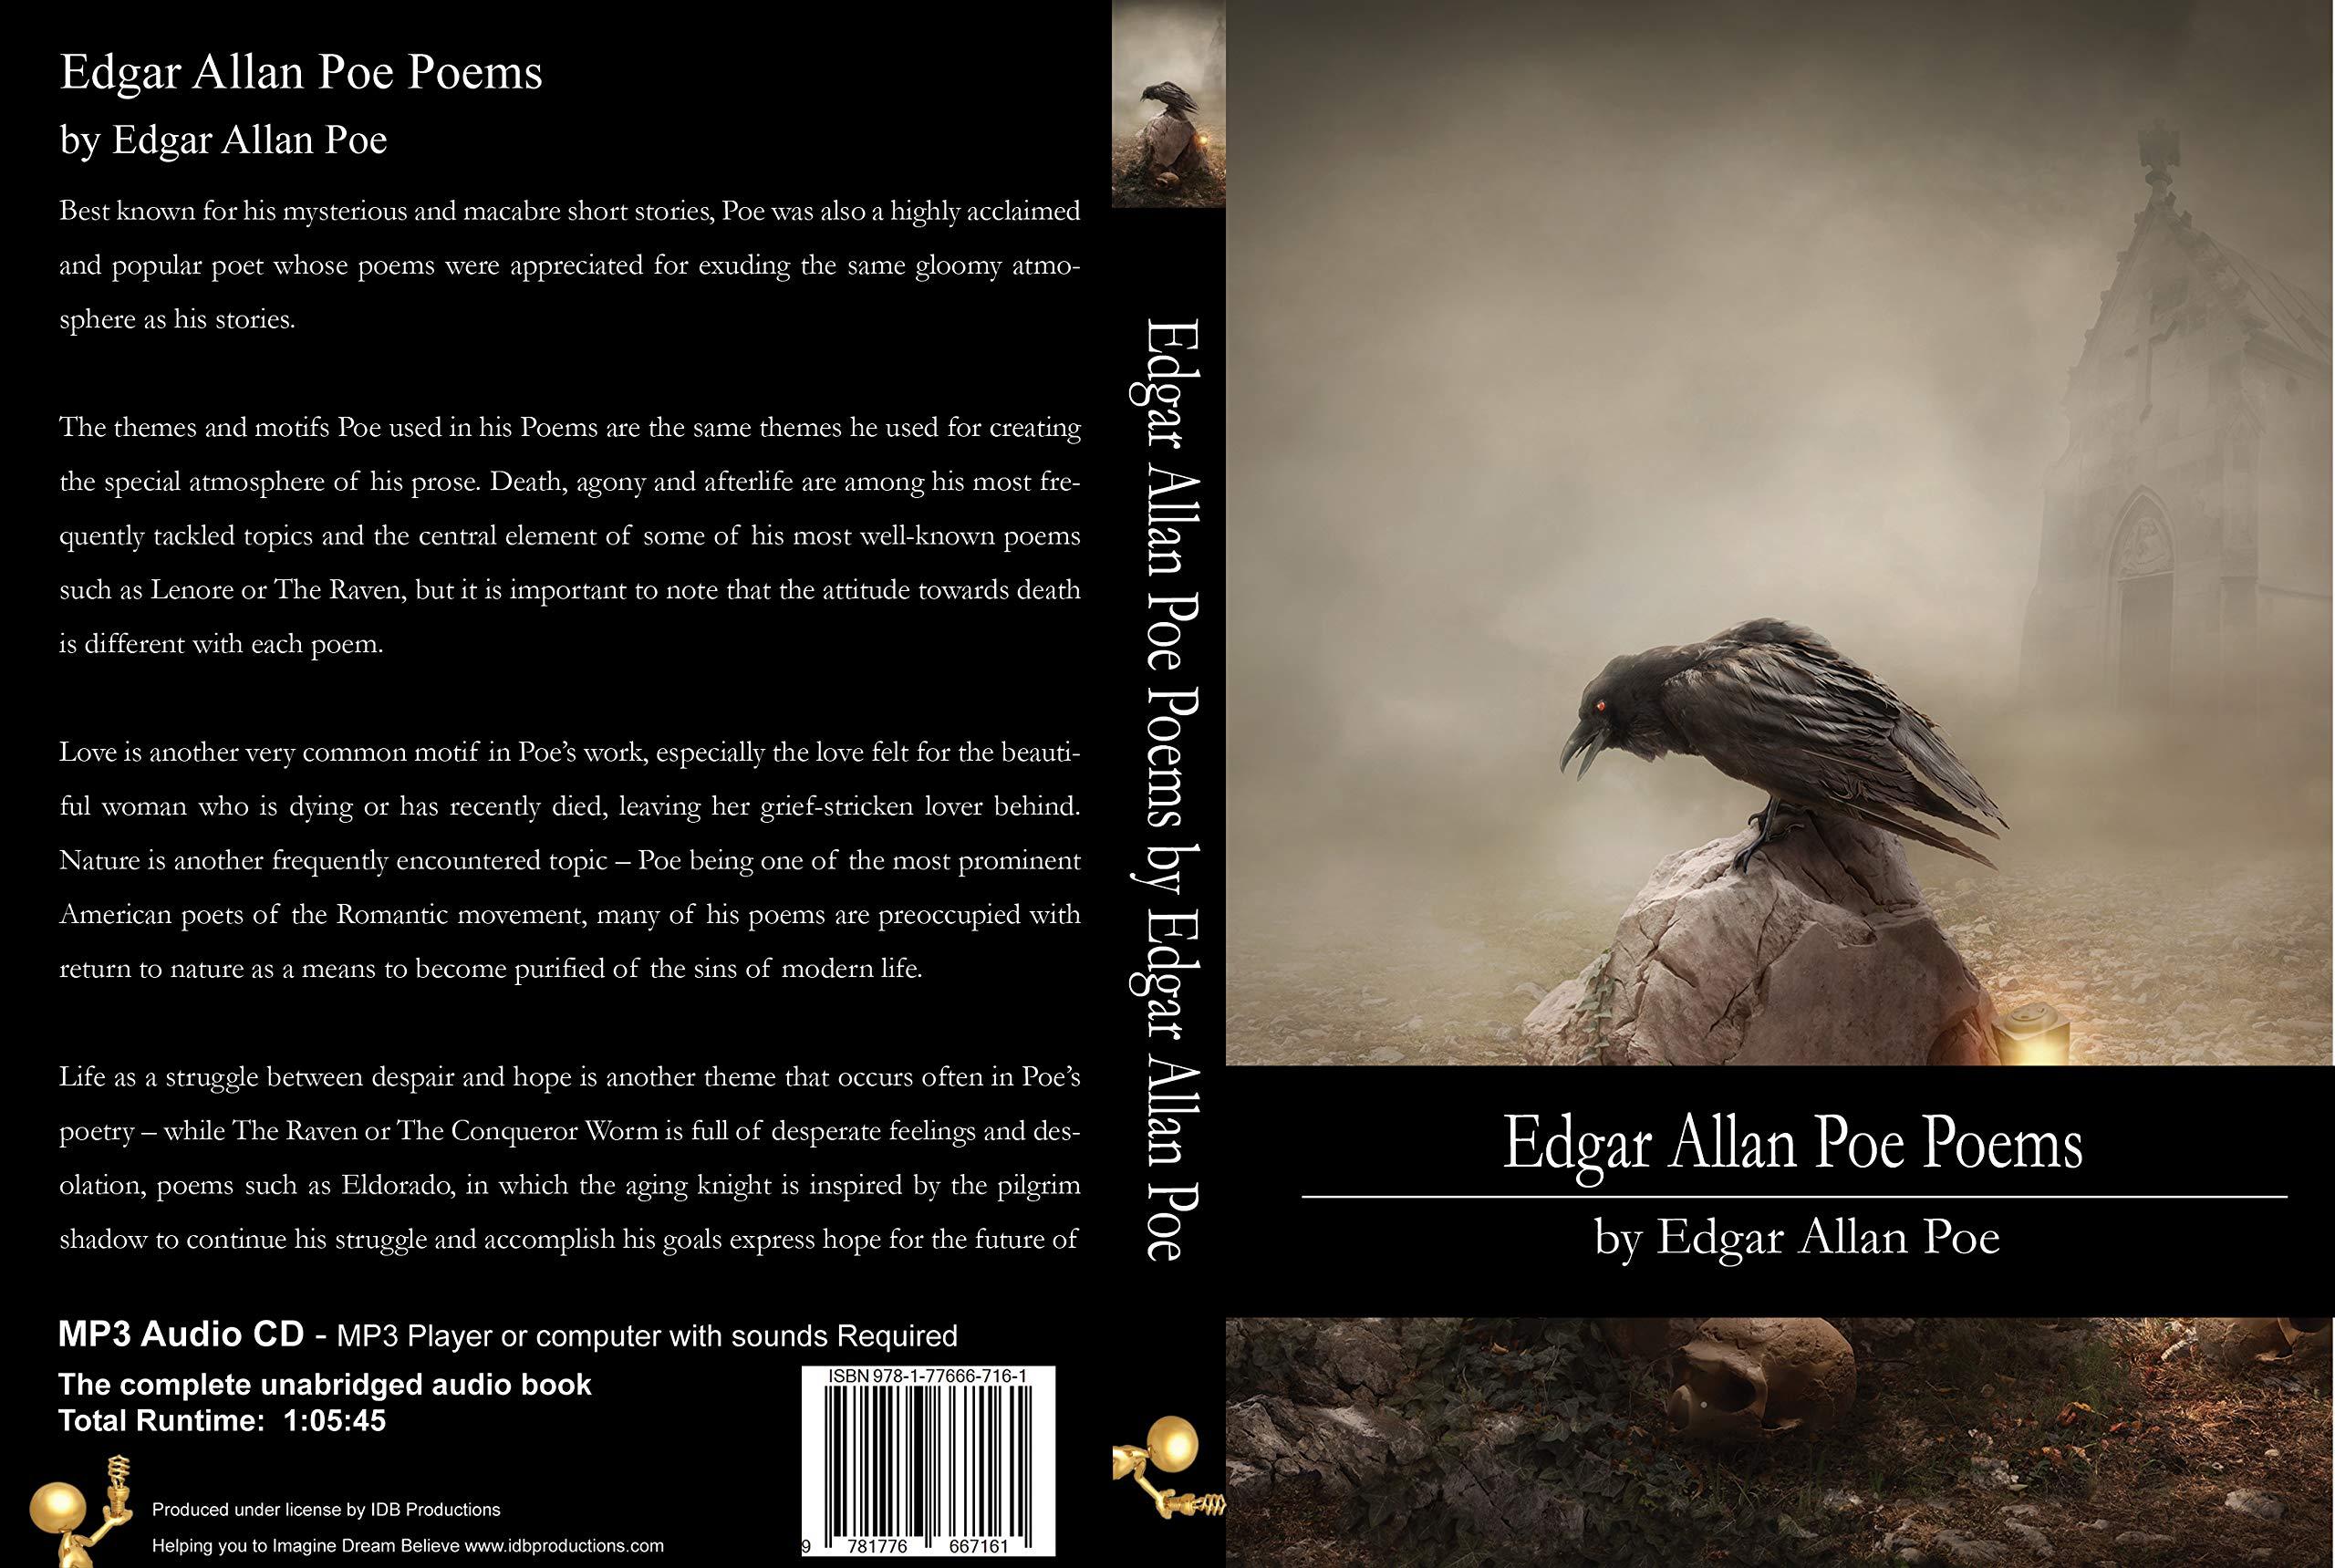 Edgar Allan Poe Poems Edgar Allan Poe 9781776667161